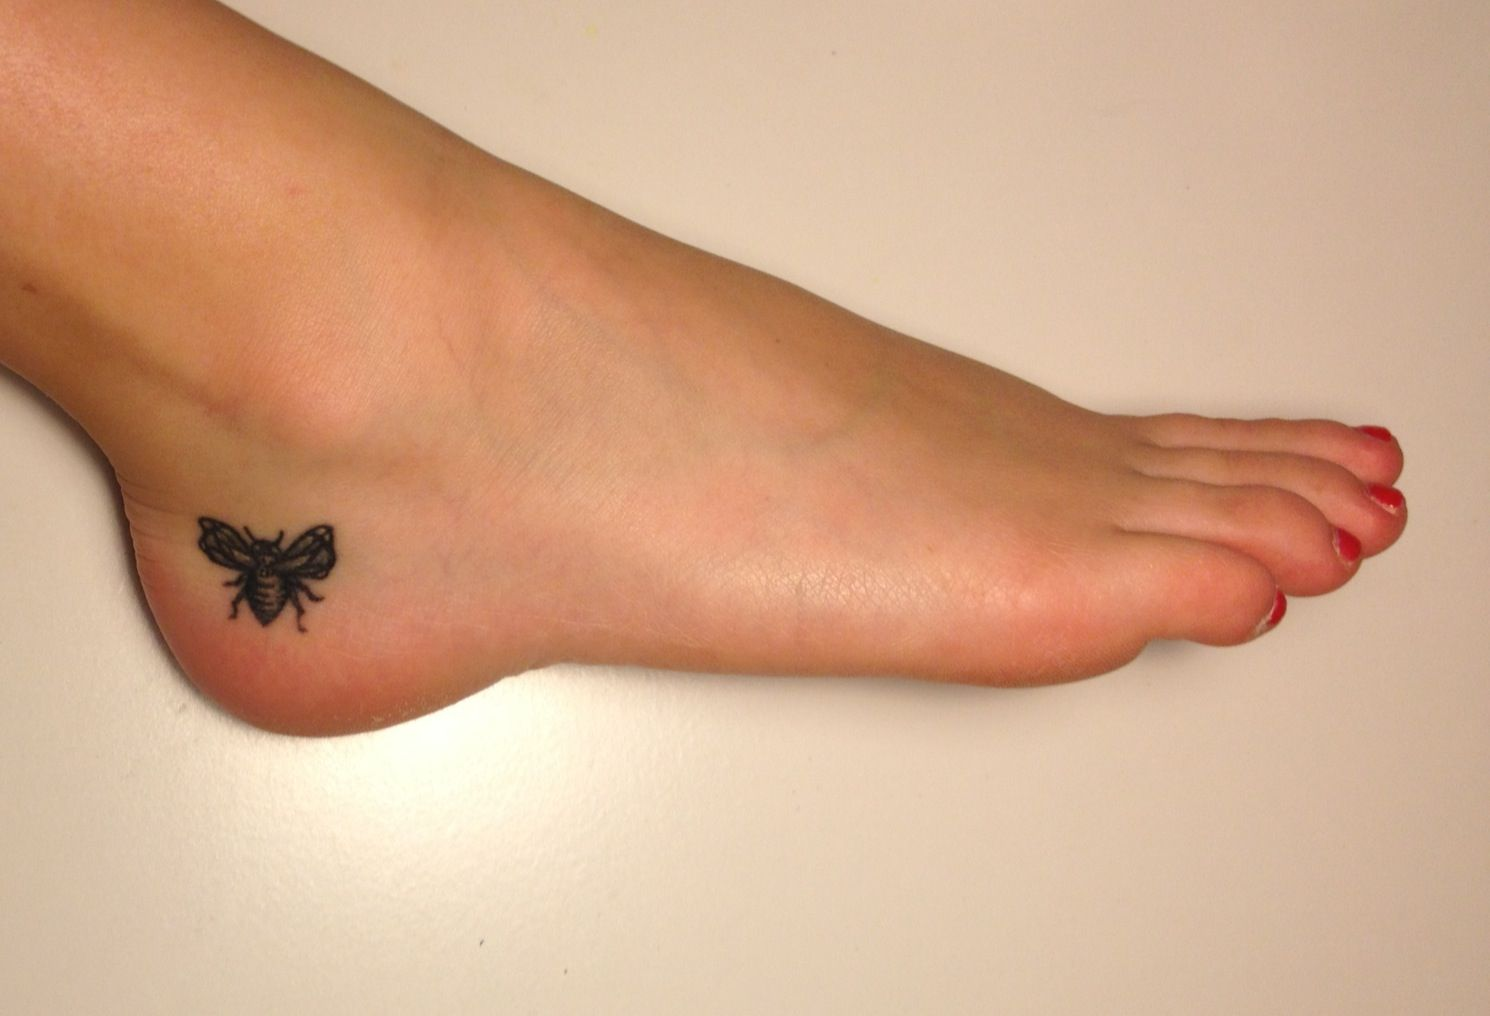 Bumblebee tattoo designer ellen bley bumblebee tattoo ideas